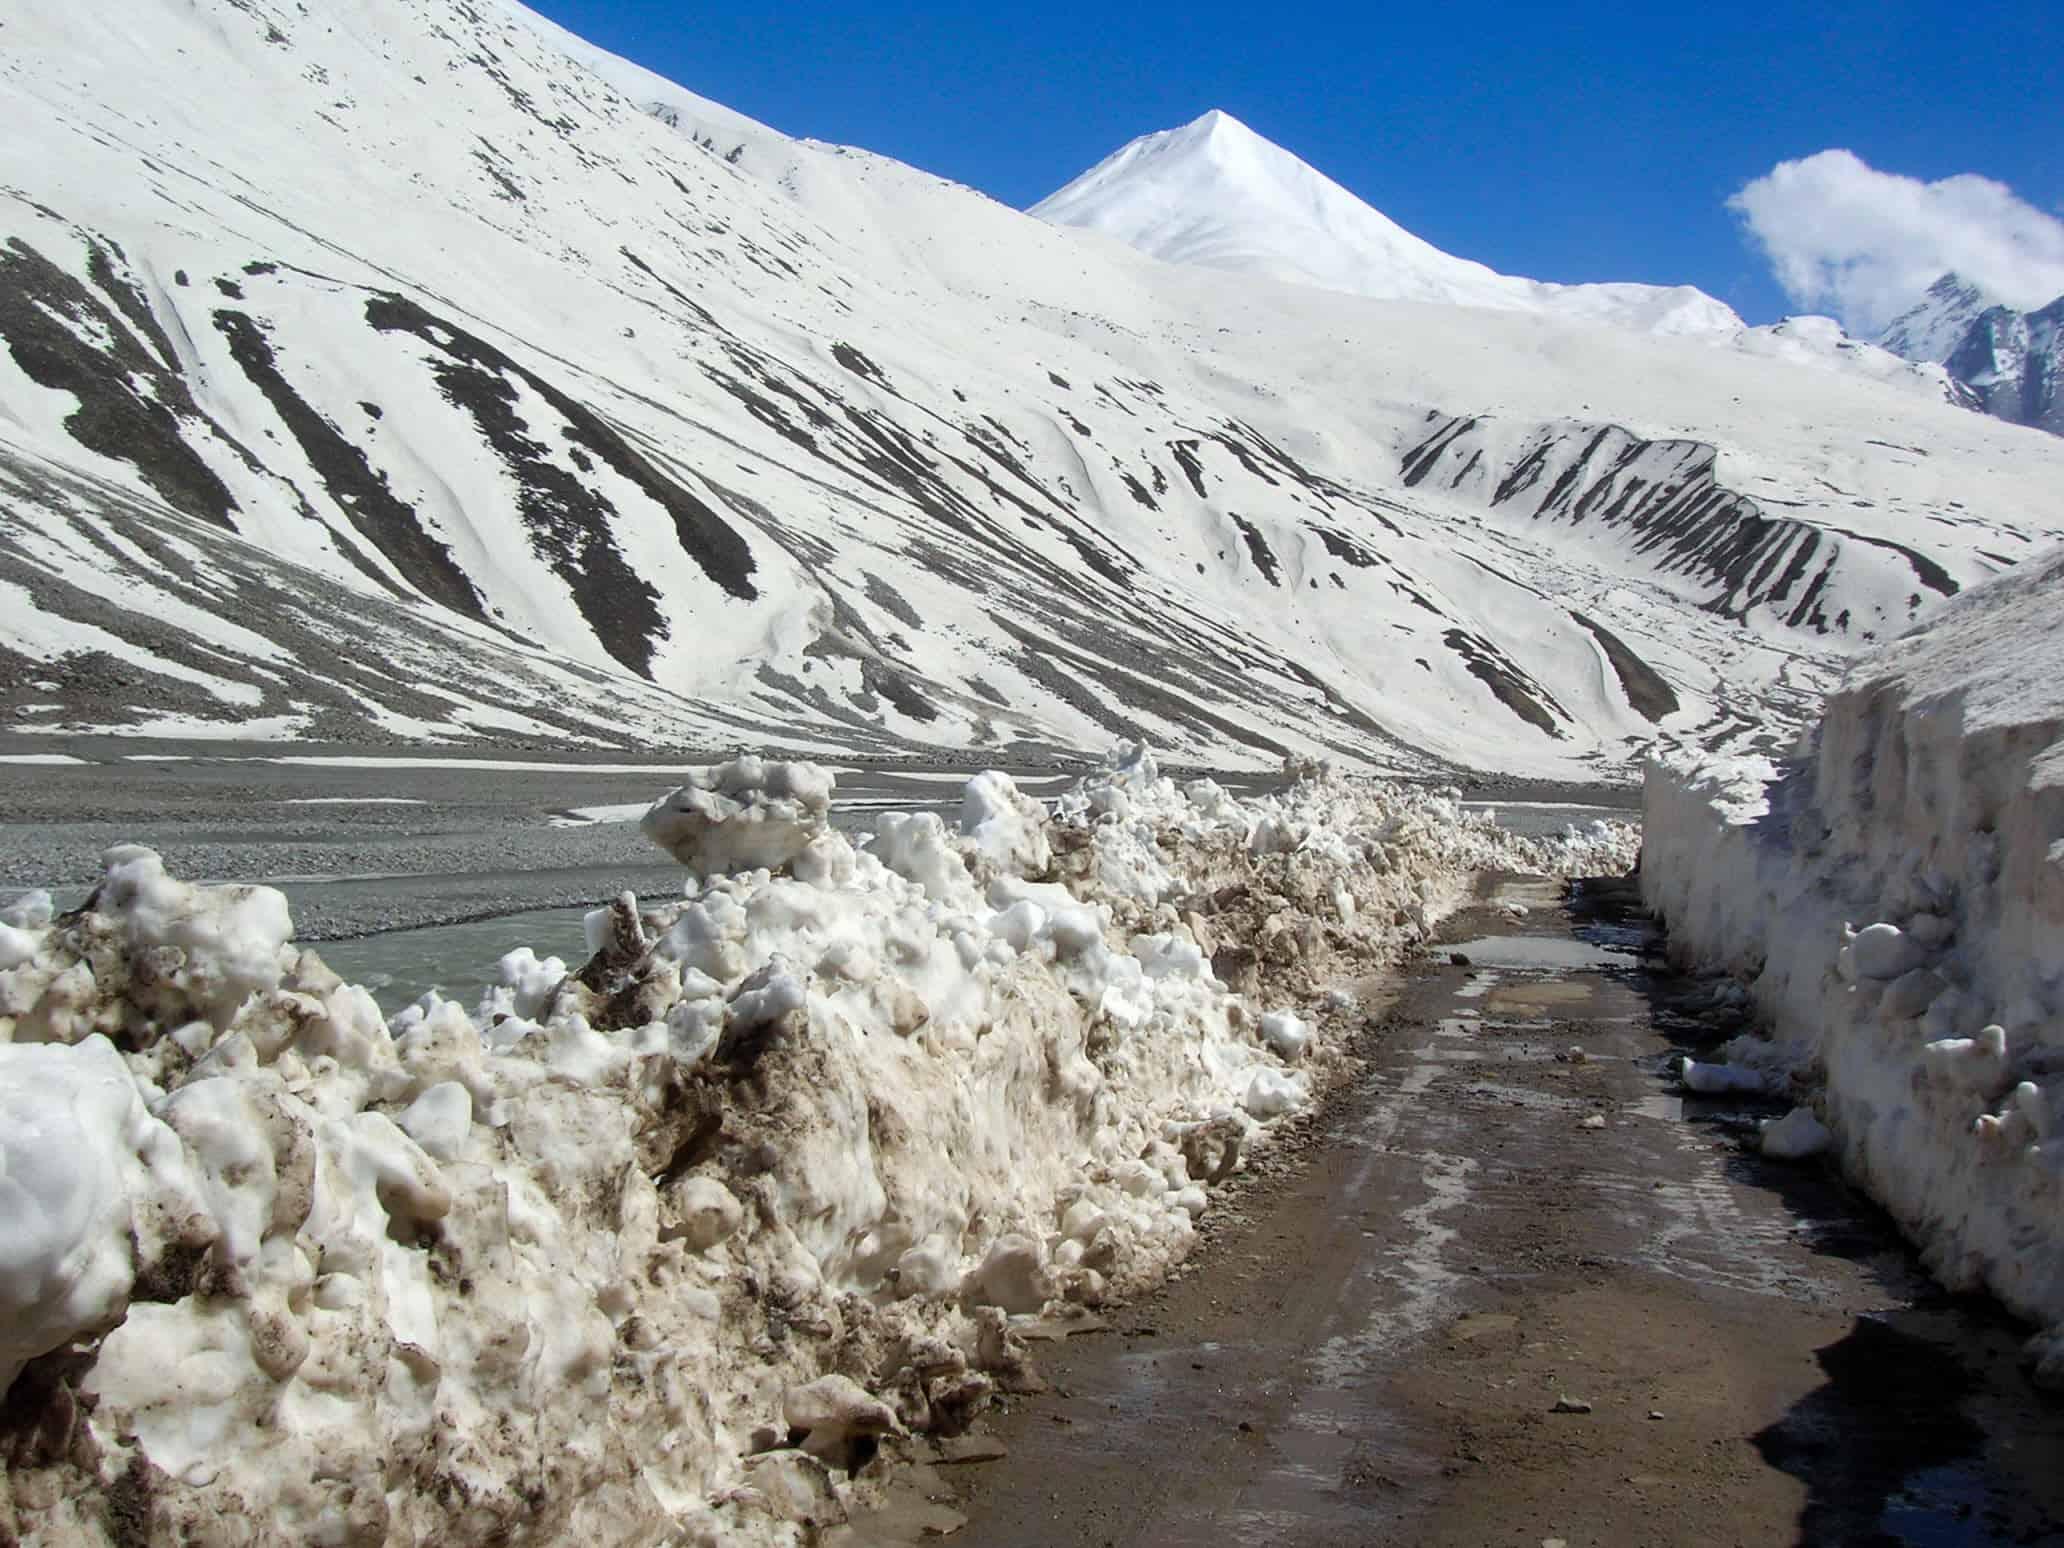 Delhi to Chandratal Lake Spiti Valley - Travel Guide